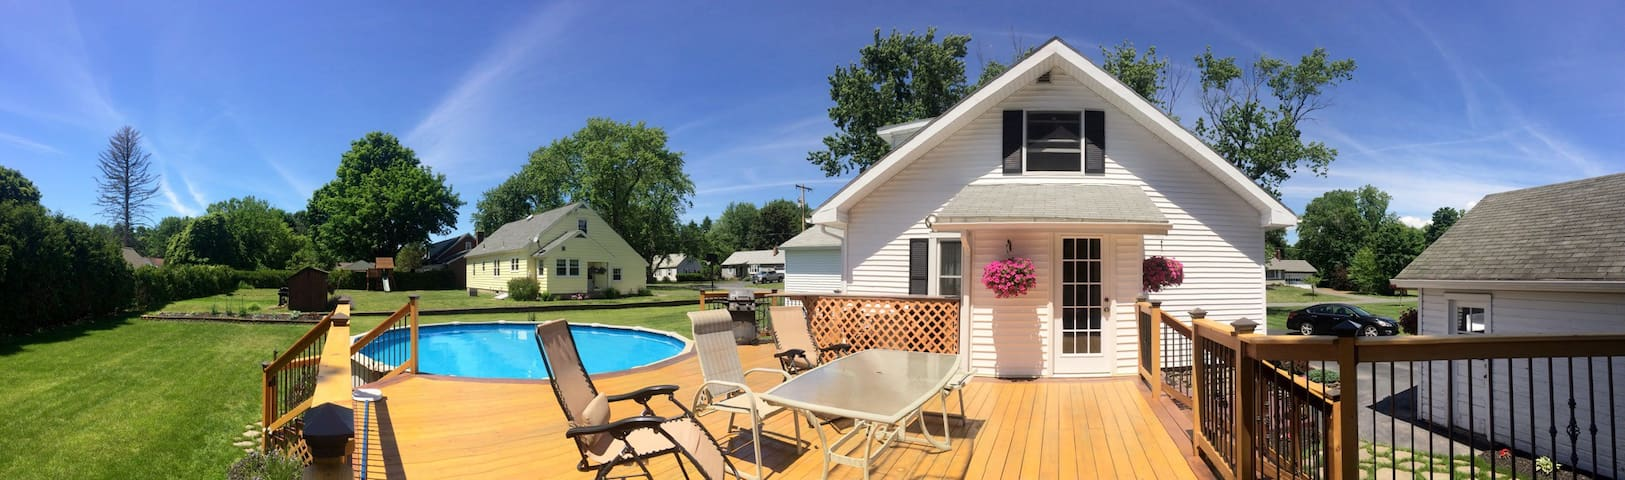 Master suite at Quaint Home! - Schenectady - Casa